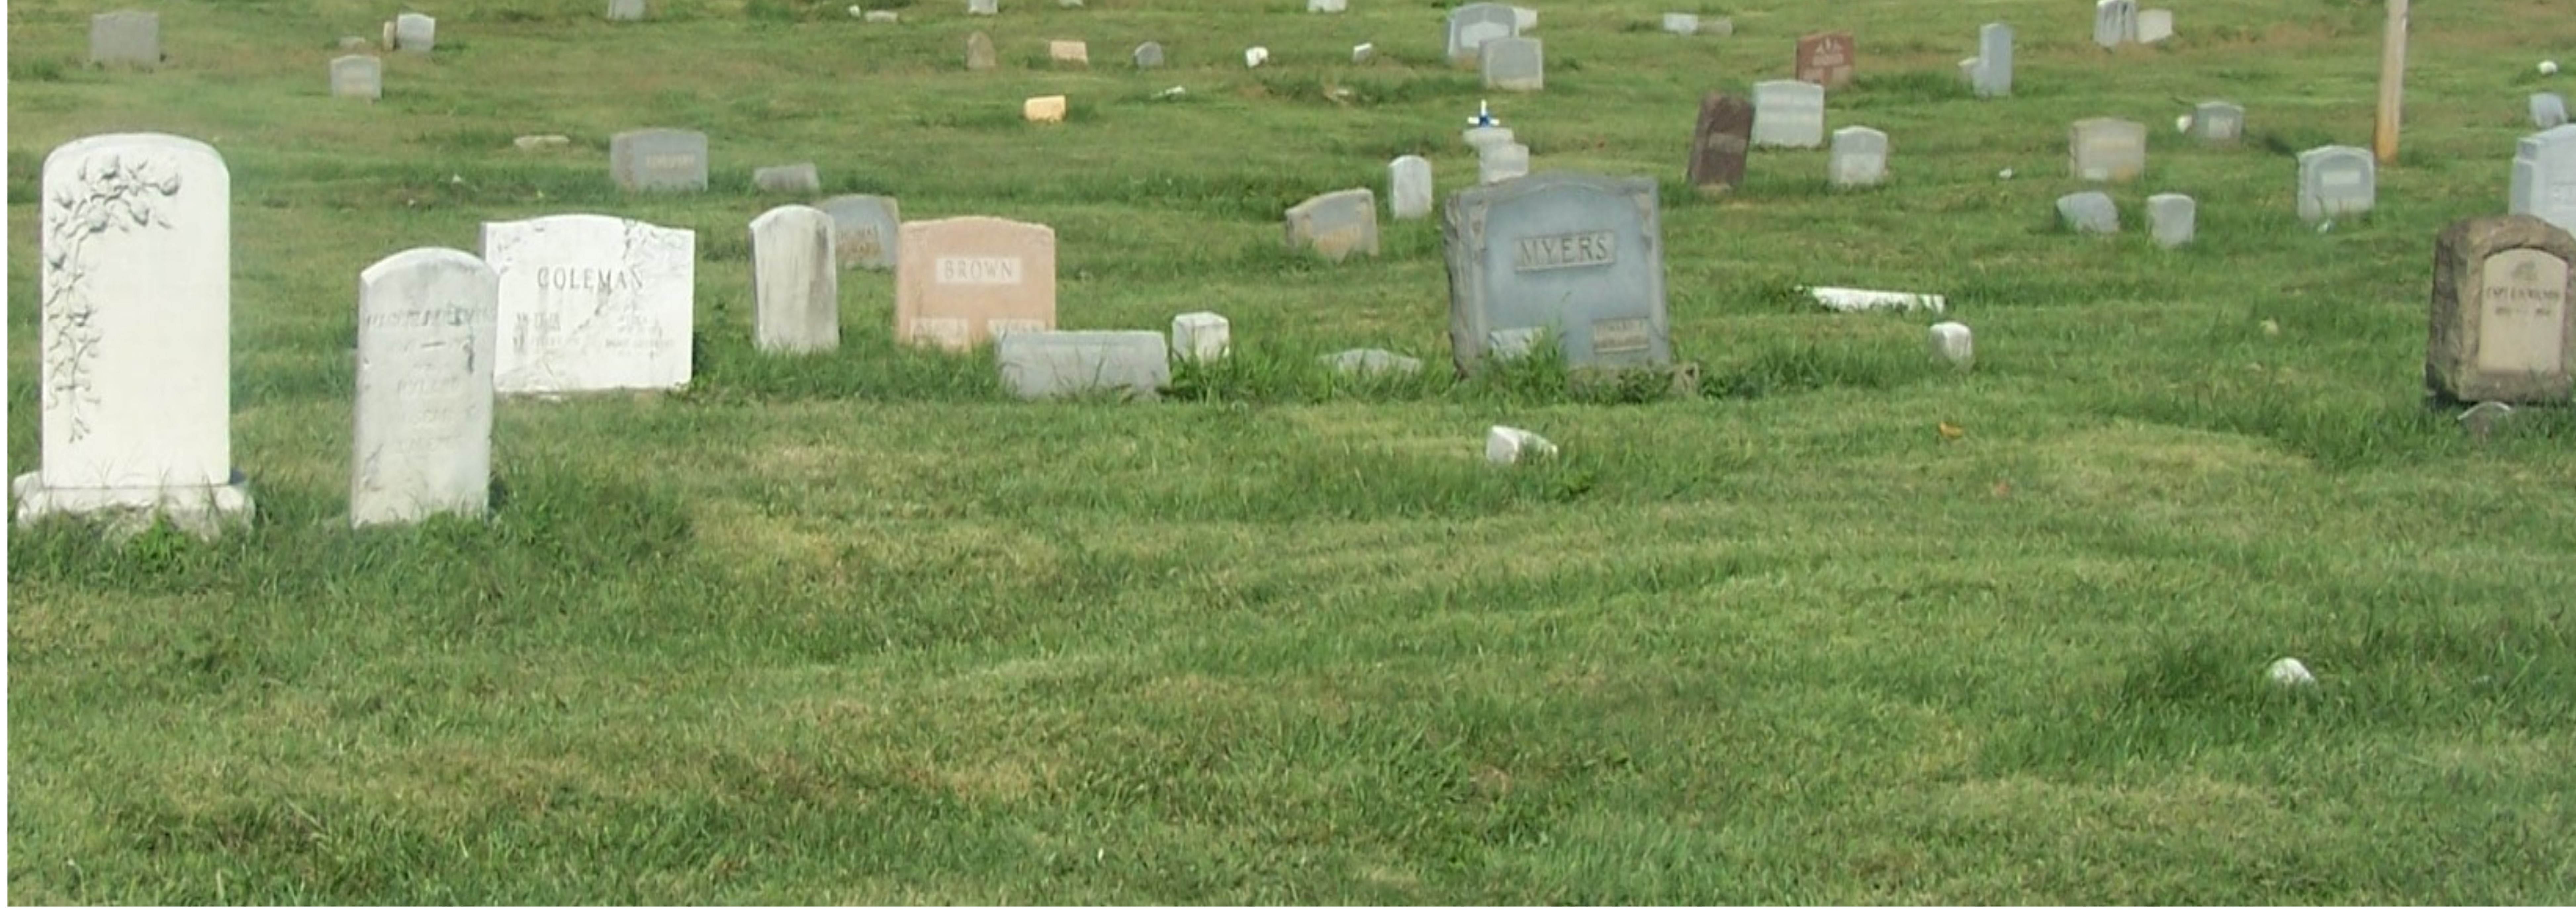 Mount Auburn Cemetery in Baltimore, MD (1807-Present)